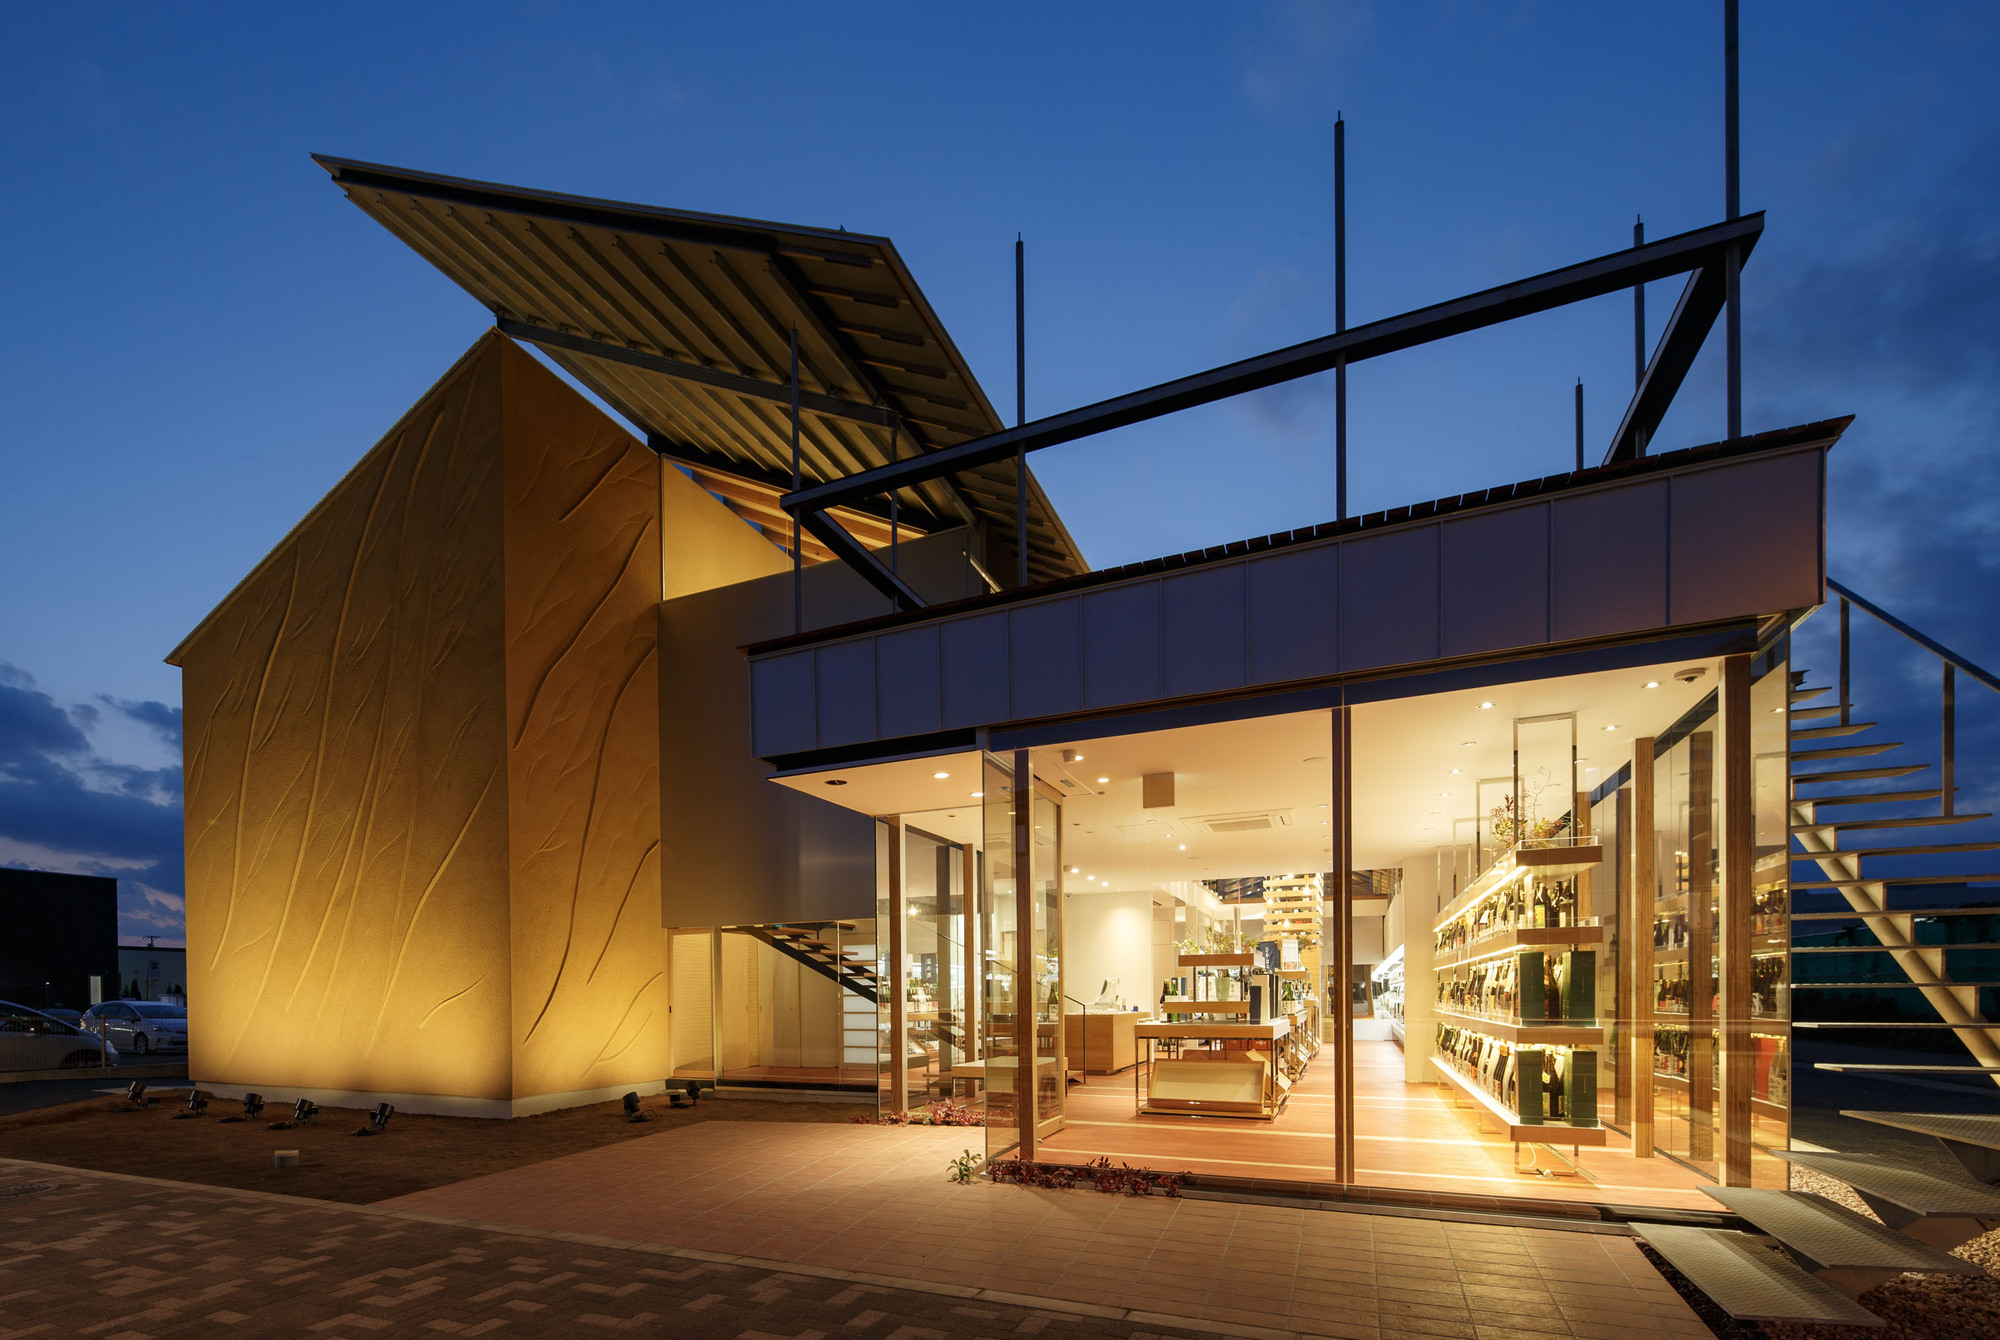 ono sake warehouse eureka g architects studio archdaily. Black Bedroom Furniture Sets. Home Design Ideas